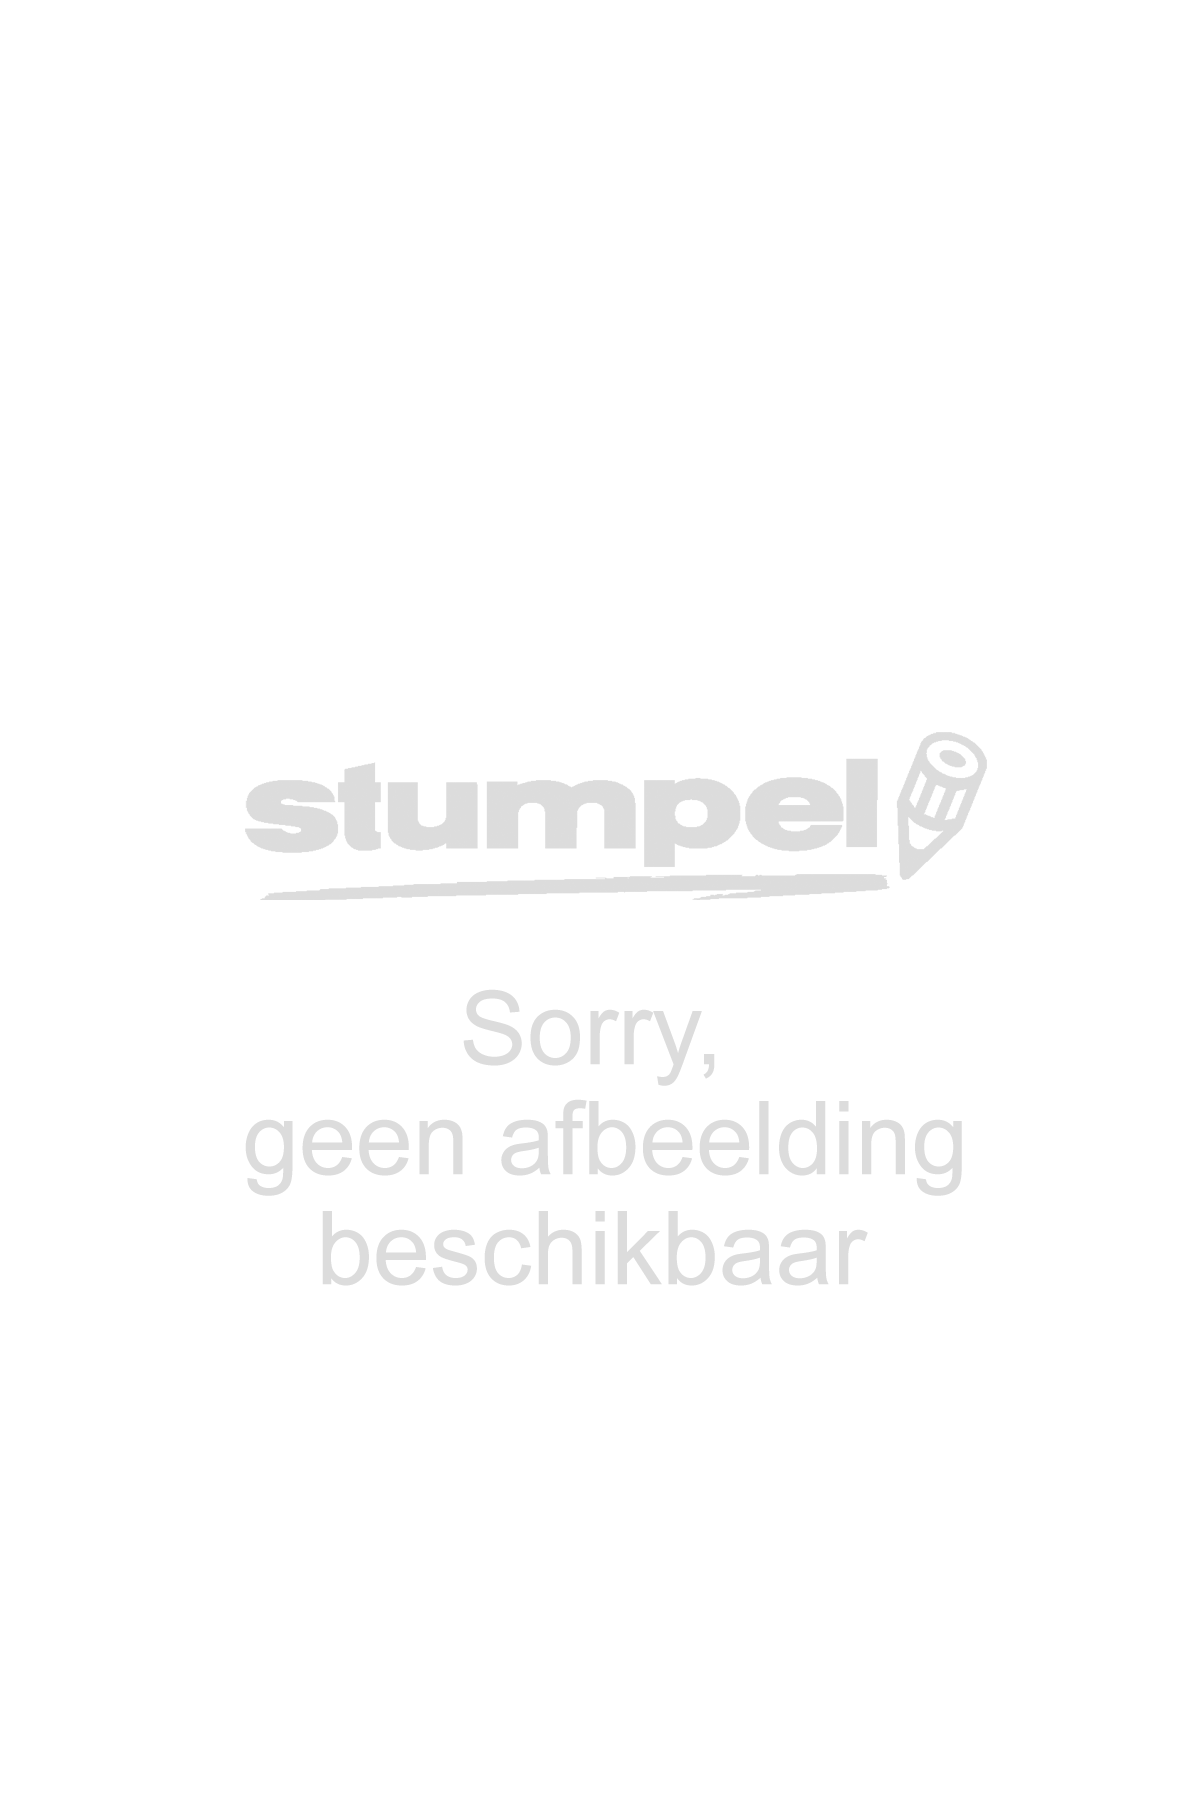 balpenvulling-lamy-m21-blauw-10139541